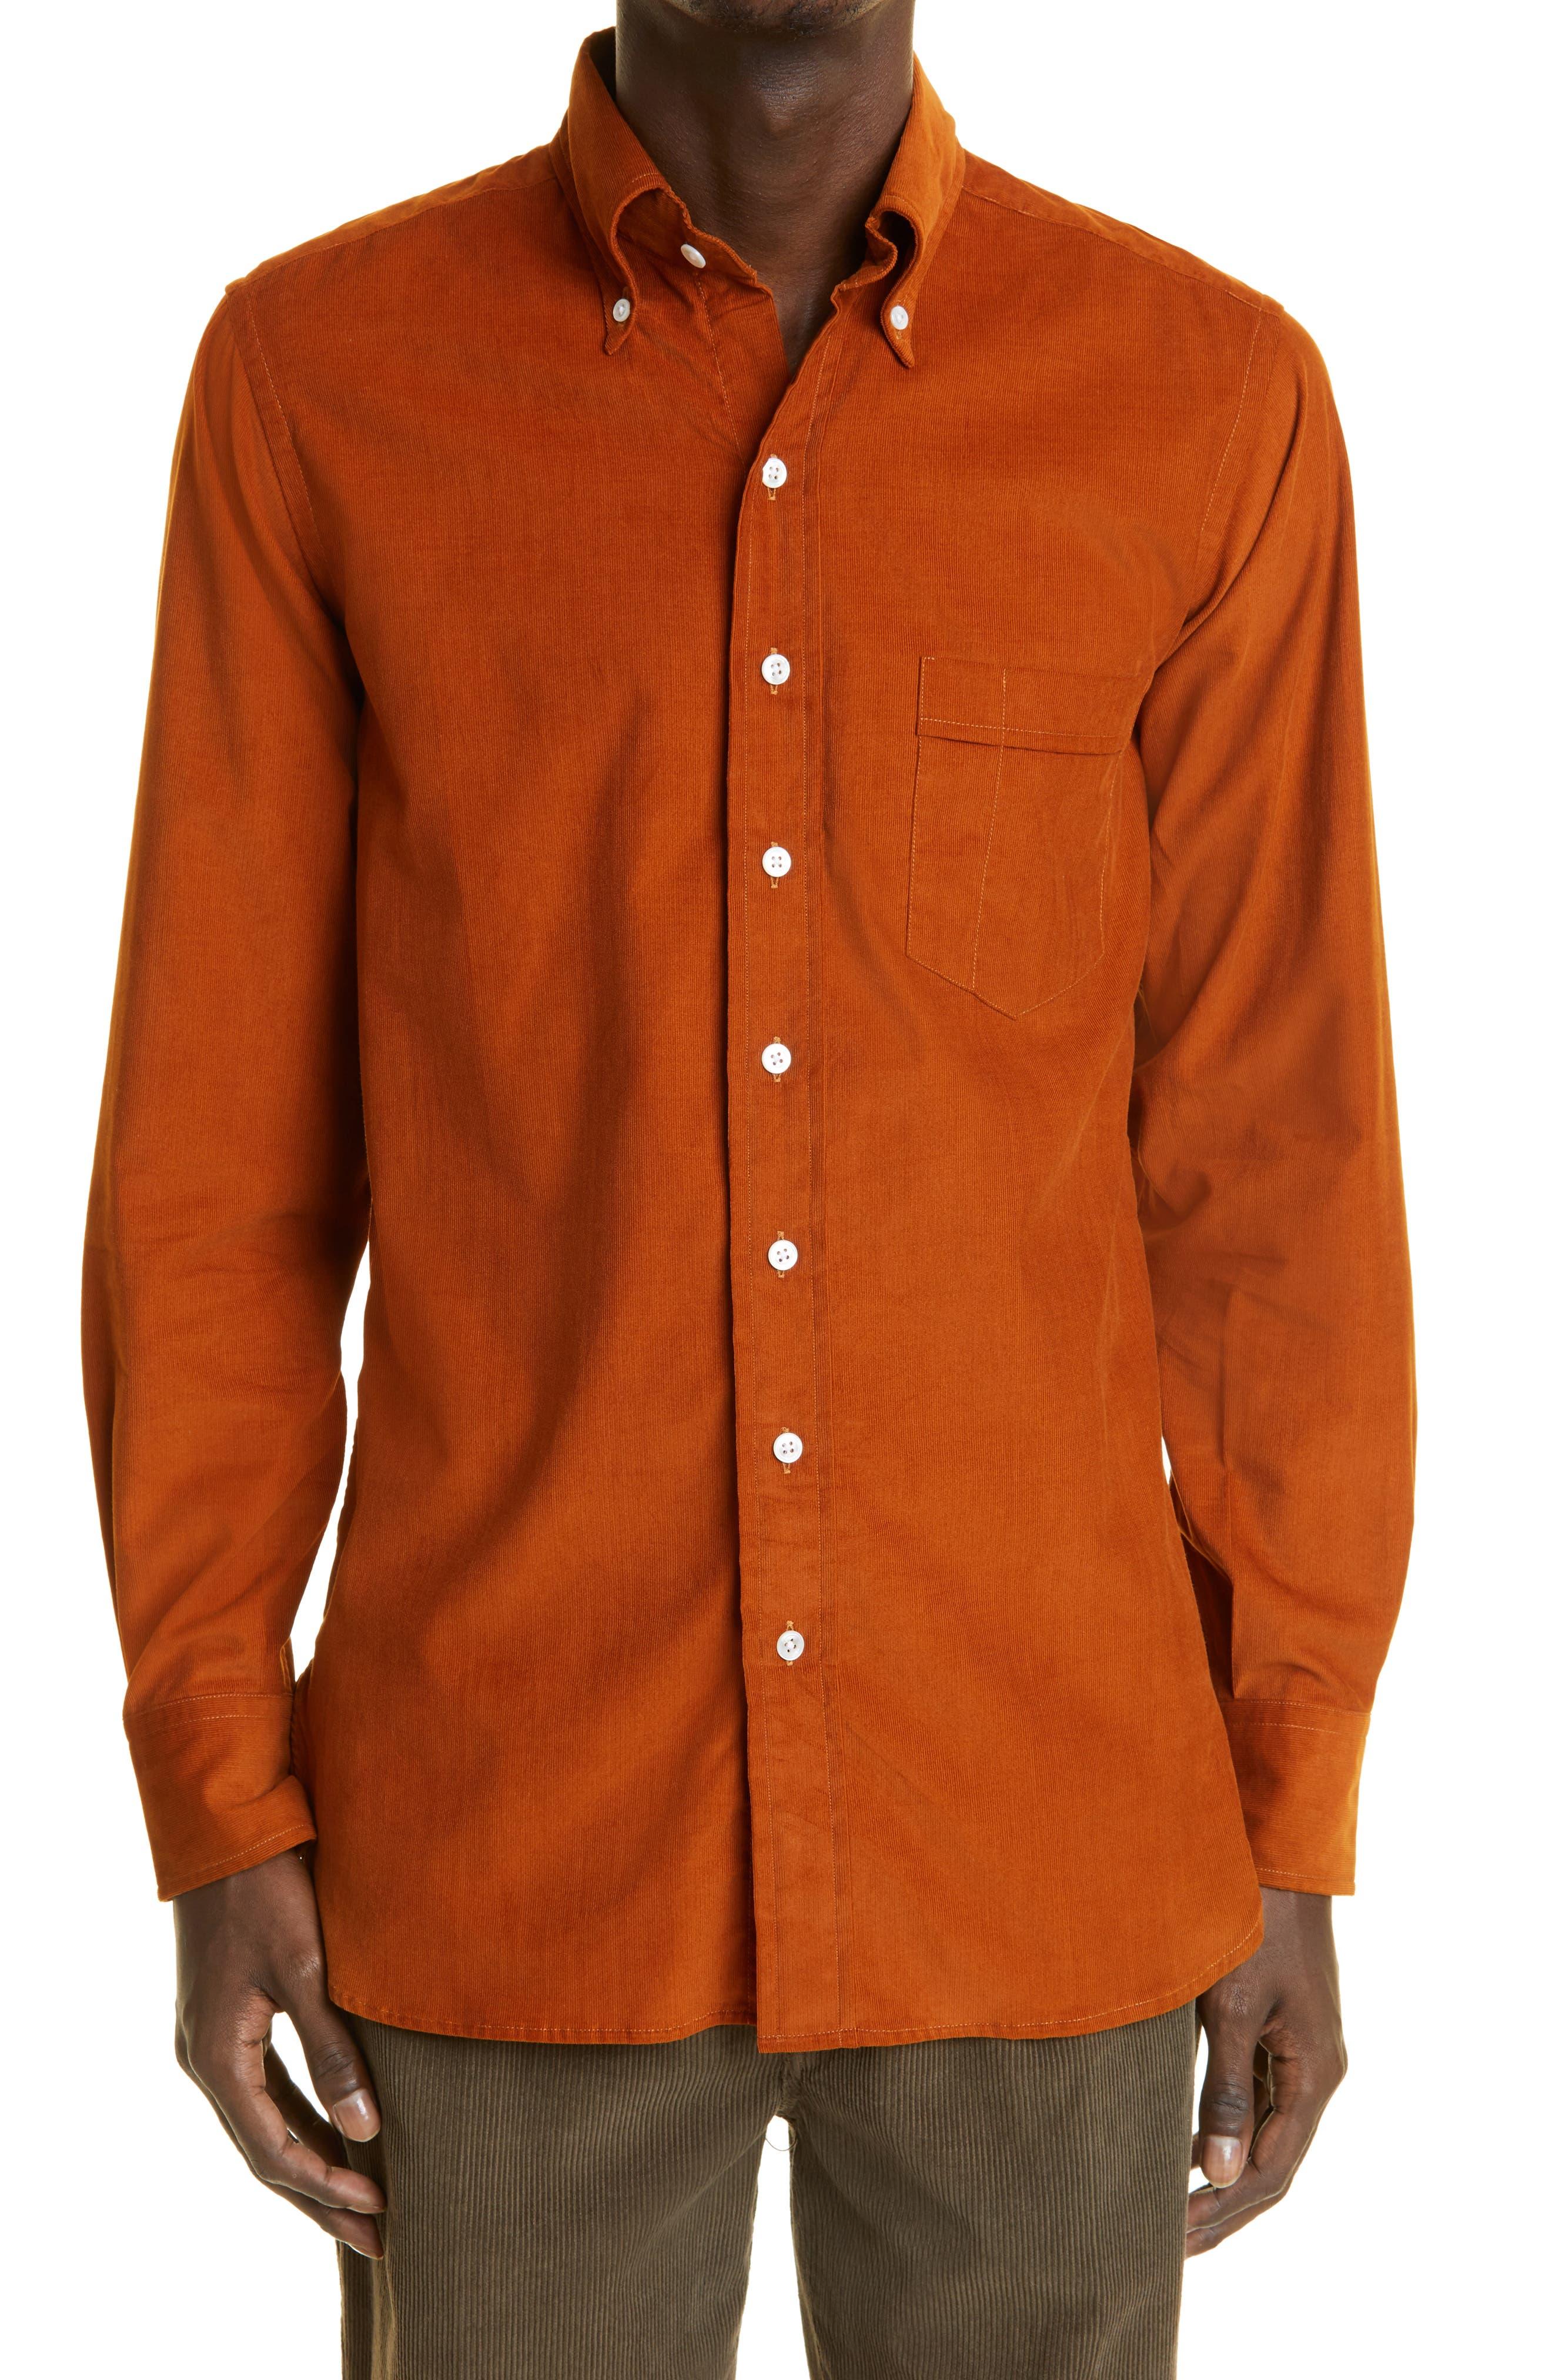 Cotton Corduroy Button-Down Shirt